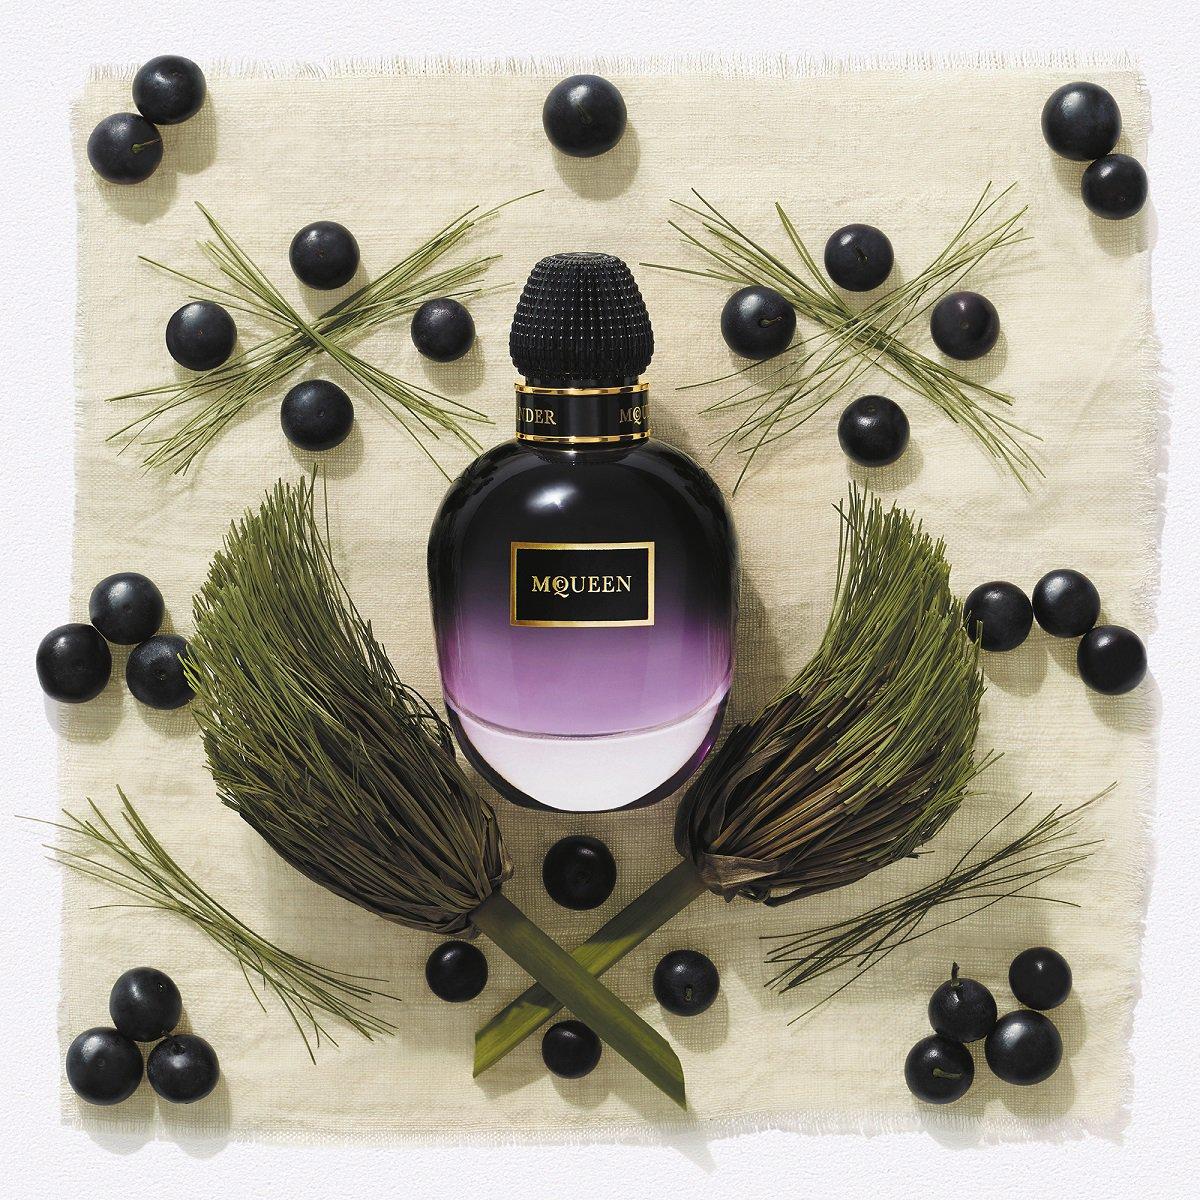 McQueen Collection DARK PAPYRUS Eau de Parfum